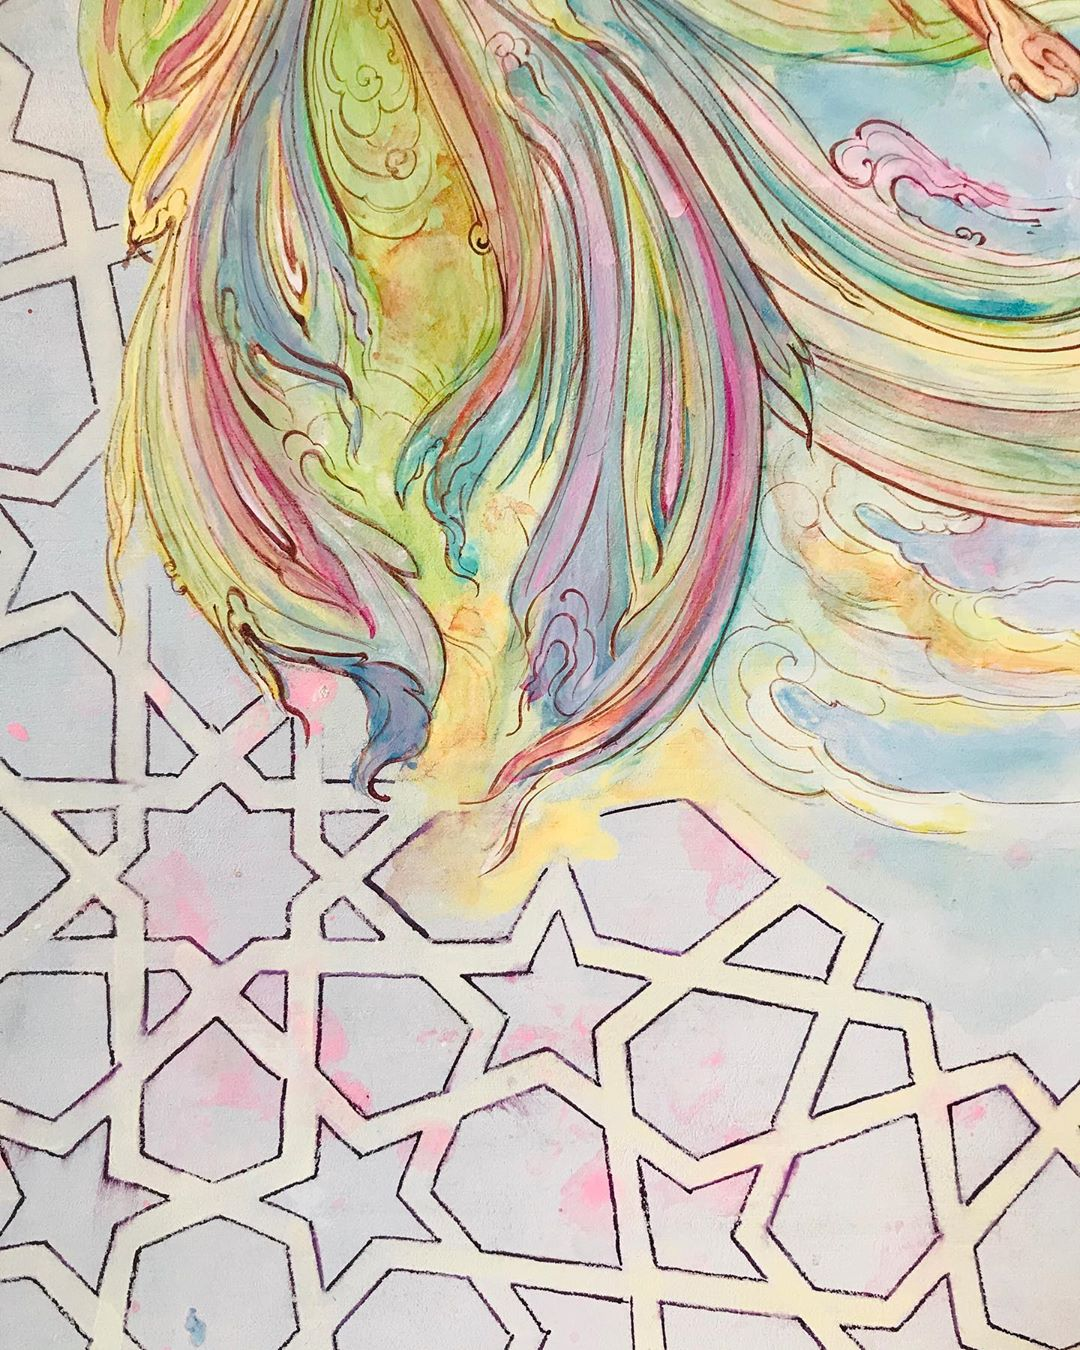 Karya Kaligrafi Detail!… Coming soon! ای خوش آن روز که پرواز کنم تا برِ دوست به  هوای سر کویش …- Ne Javaher